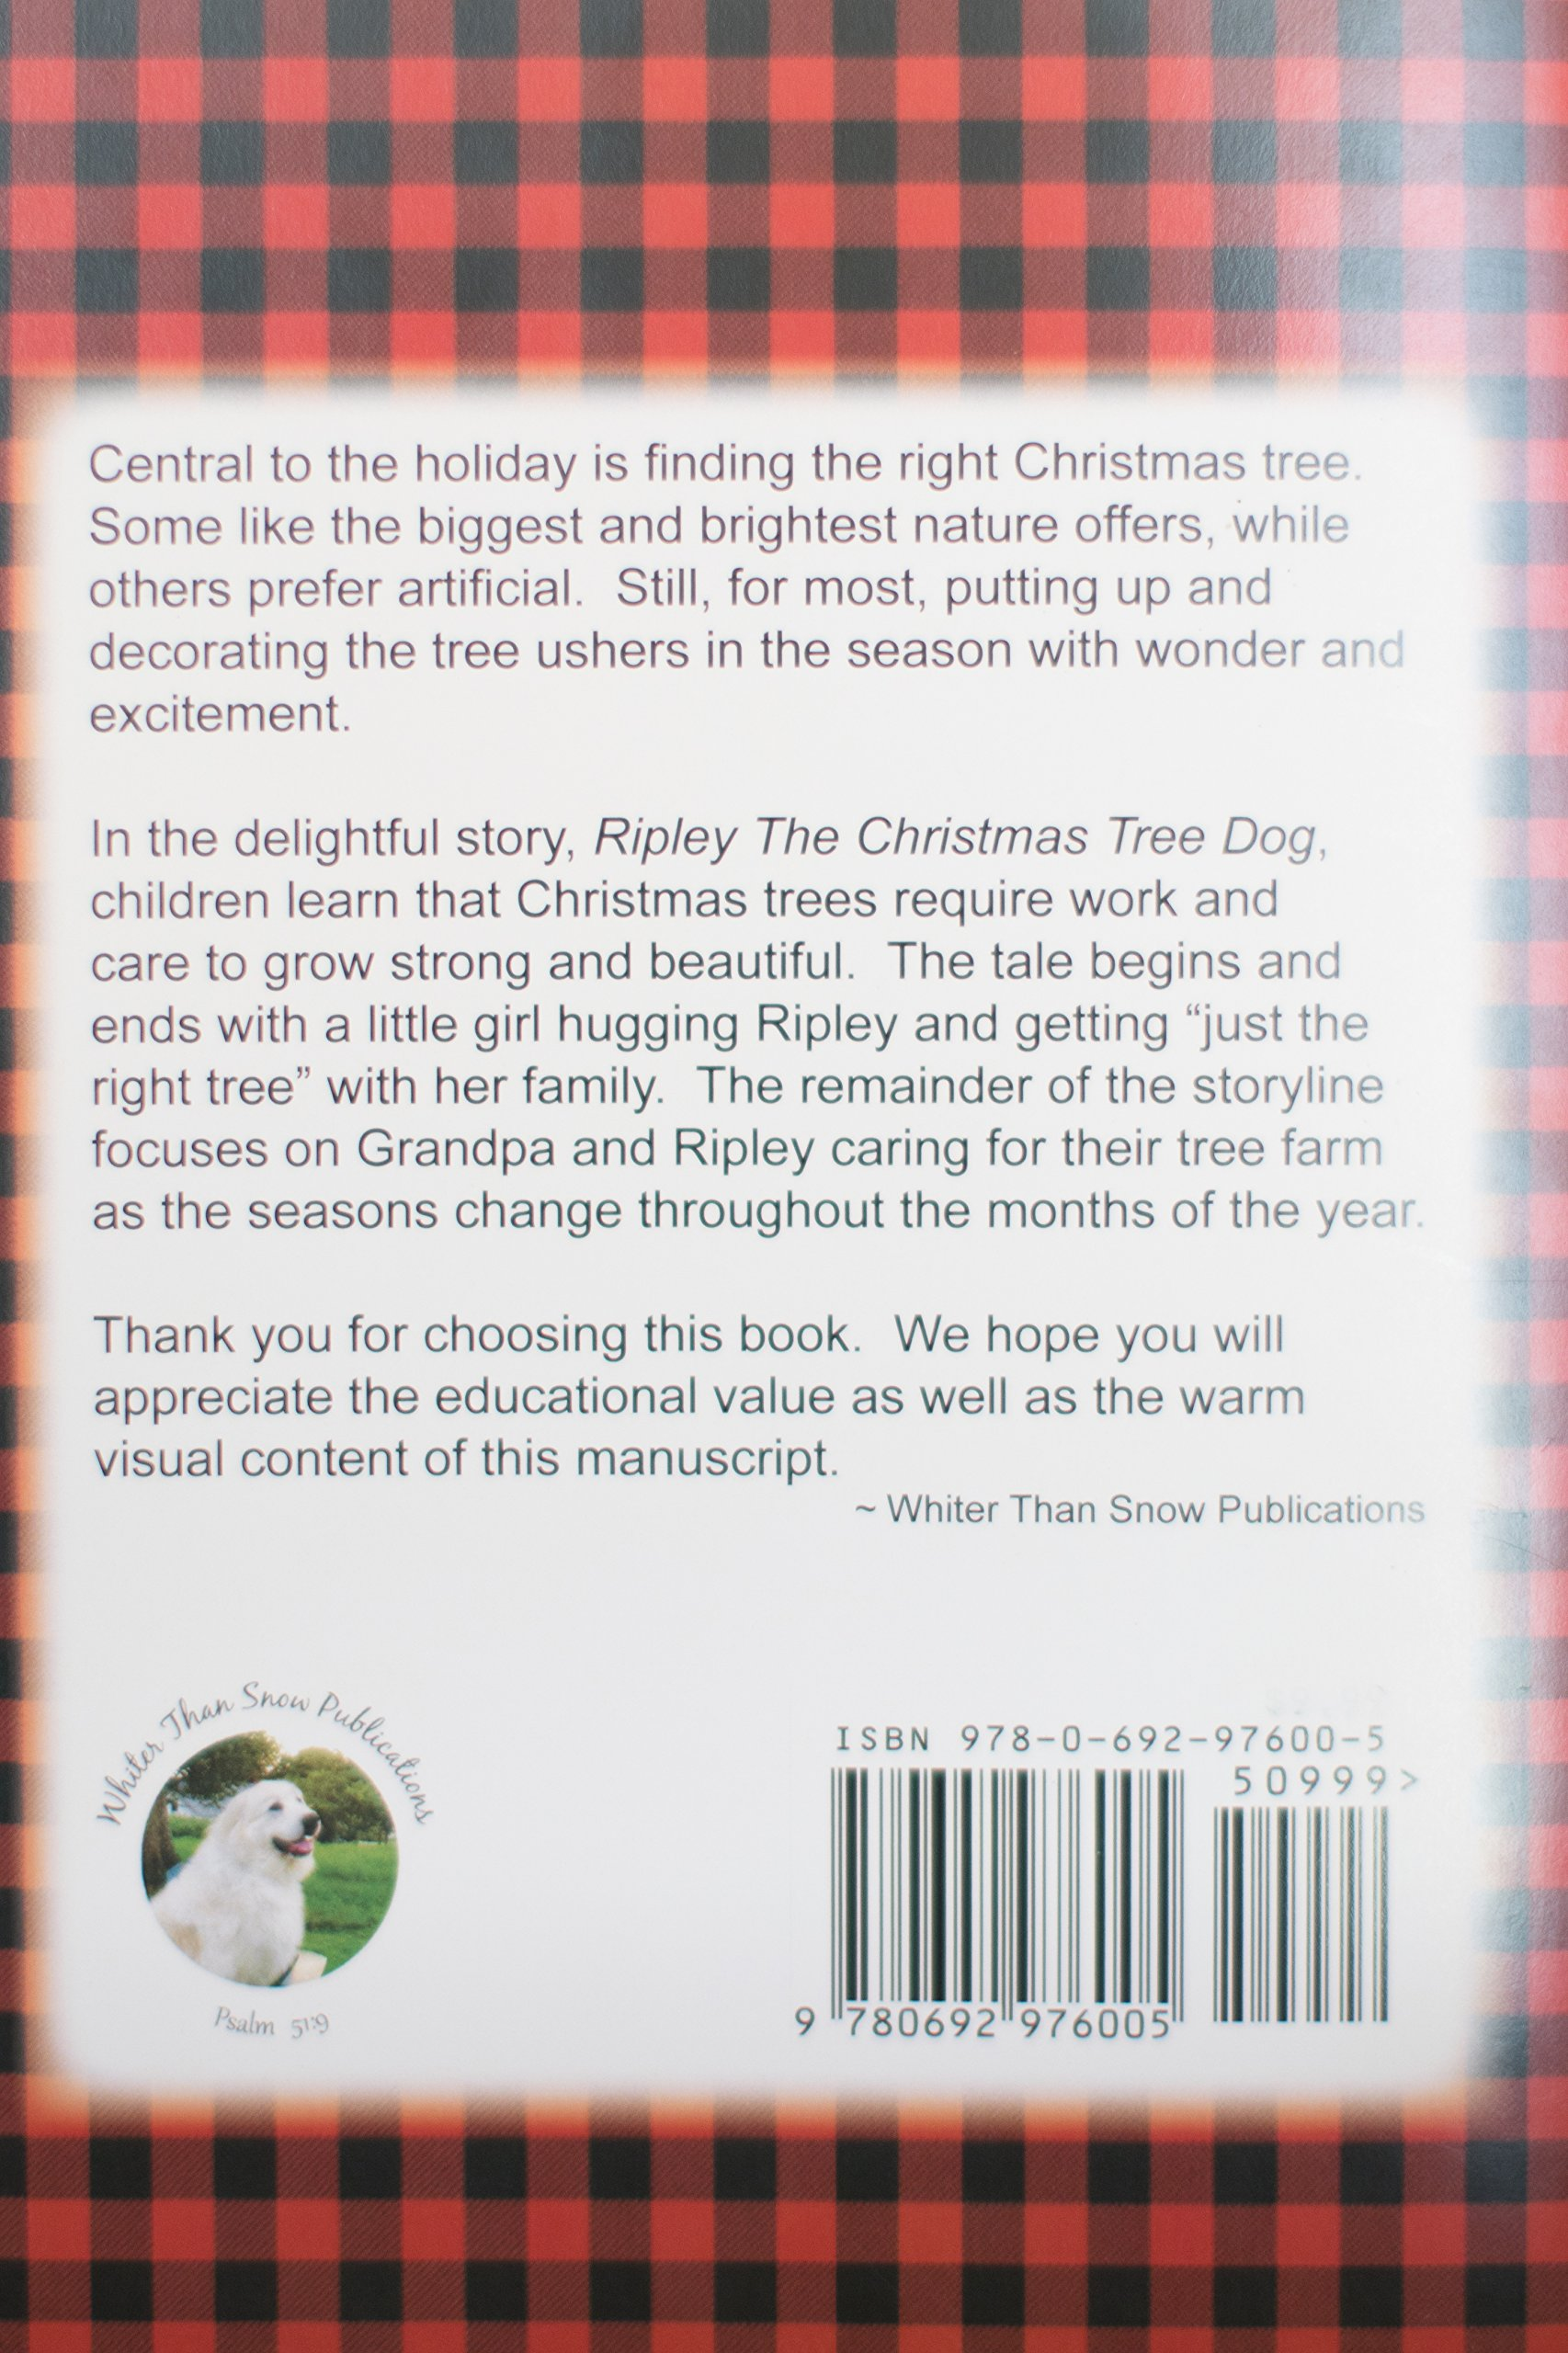 ripley the christmas tree dog fredonna ladd carol ouellette 9780692976005 amazoncom books